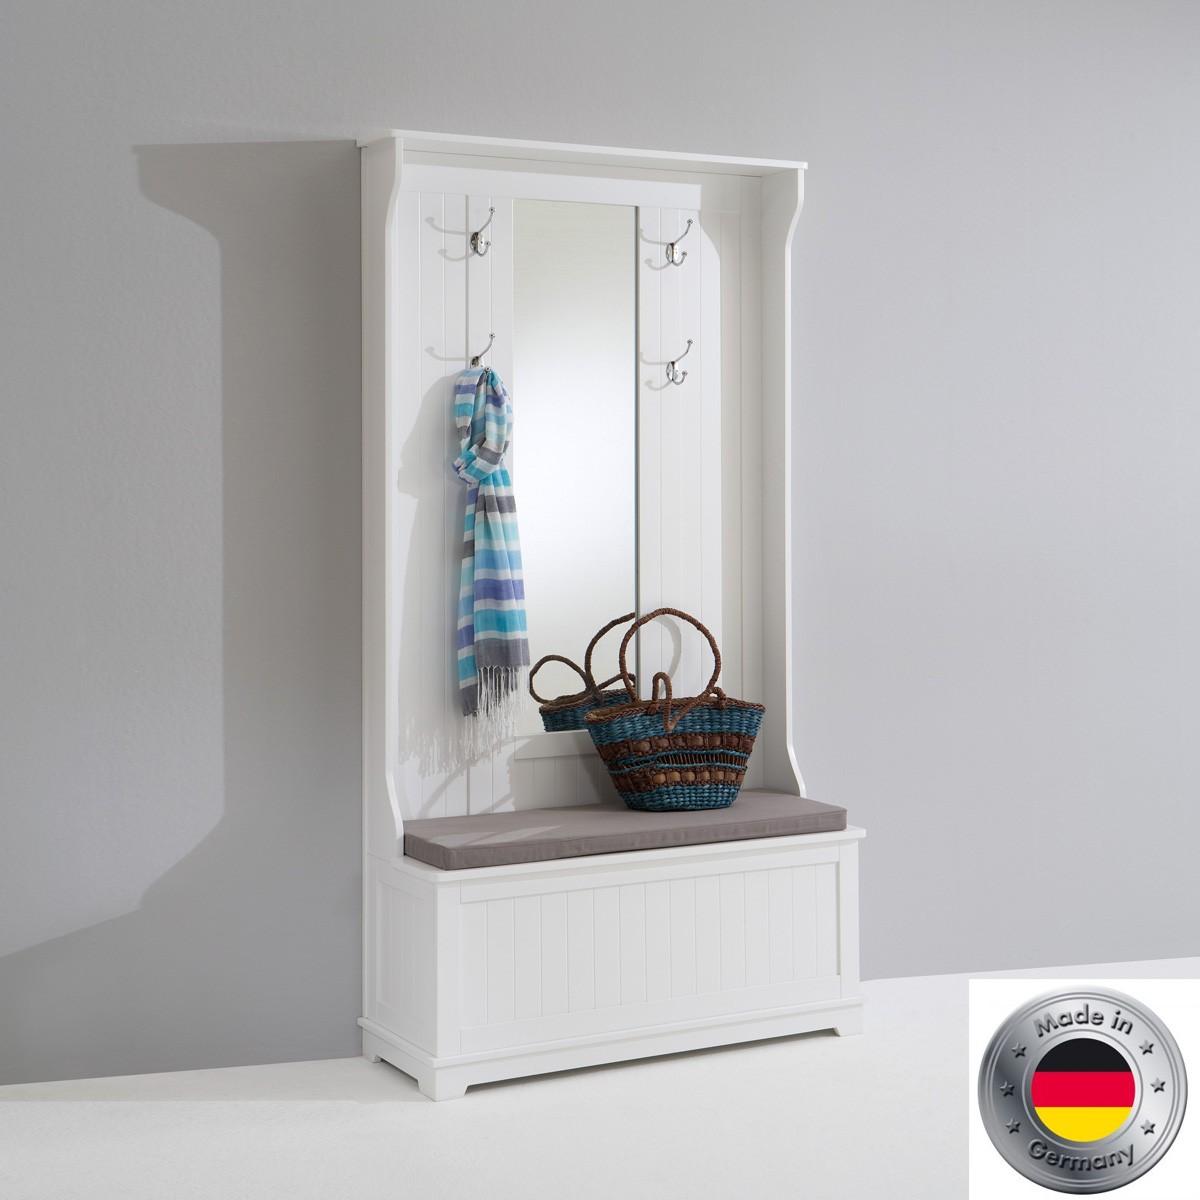 garderoben set grau bilder das sieht wunderbar mobelpix. Black Bedroom Furniture Sets. Home Design Ideas